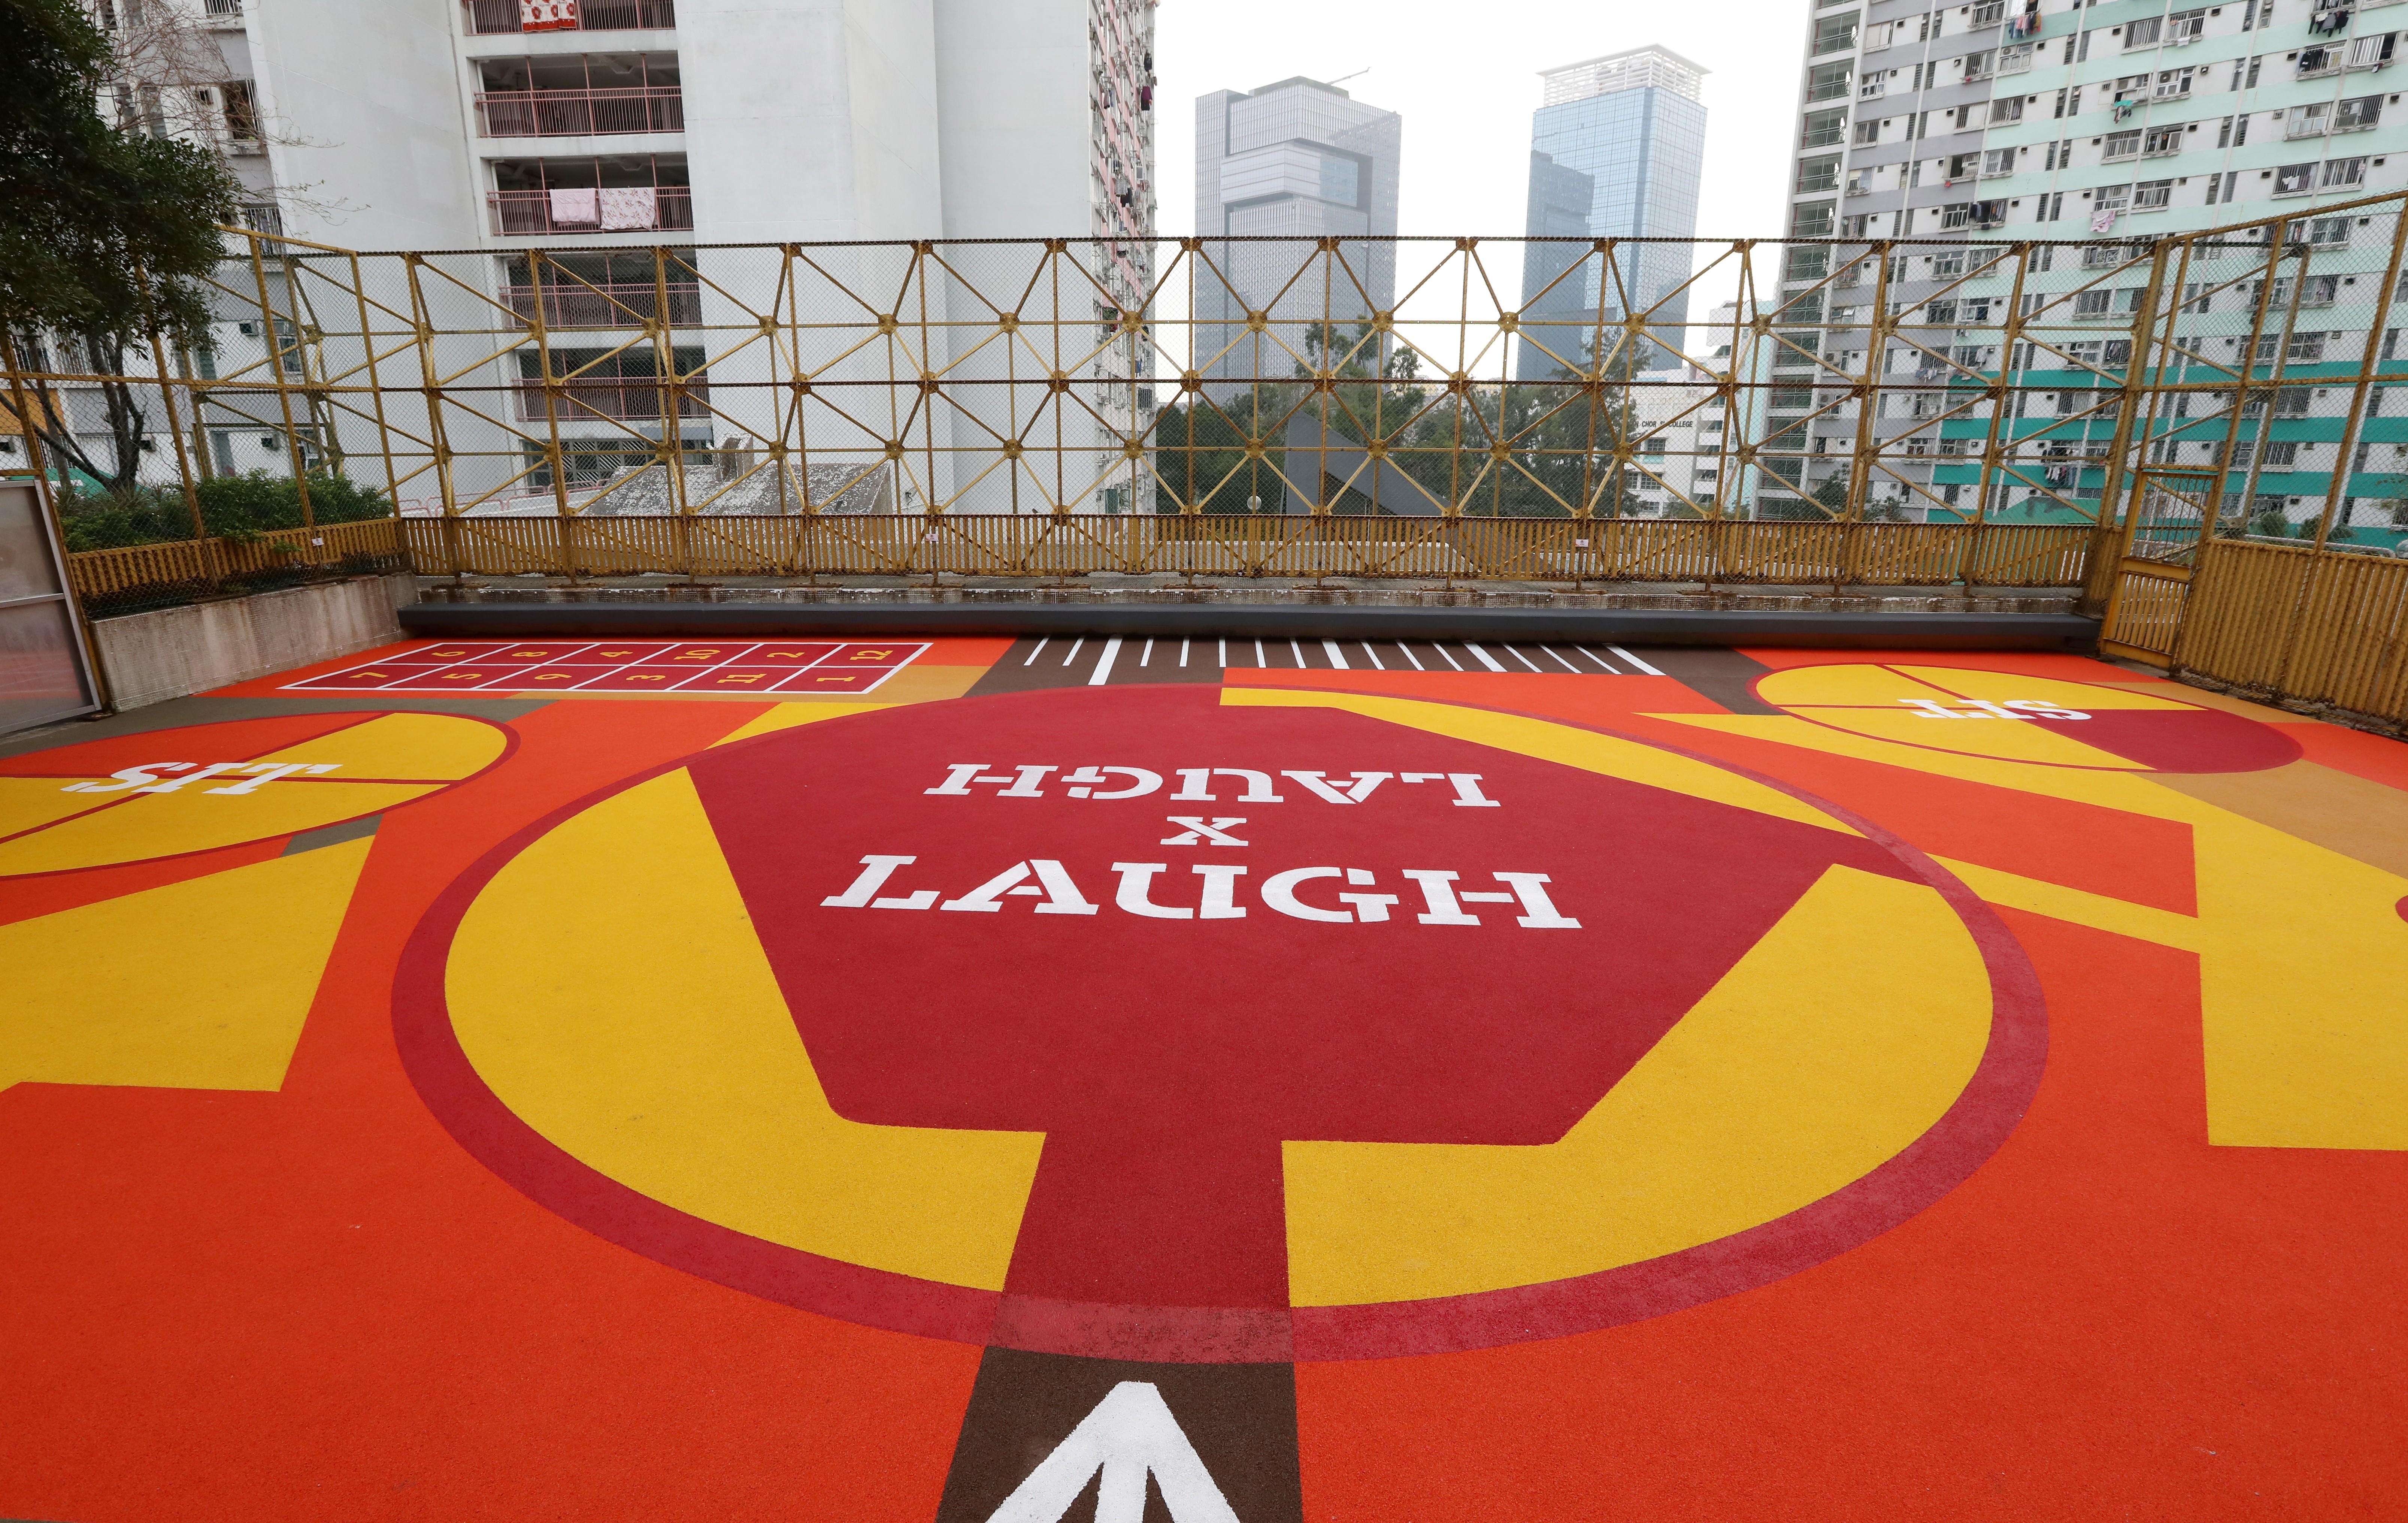 Reborn Hong Kong recreation ground in Kwun Tong draws sports